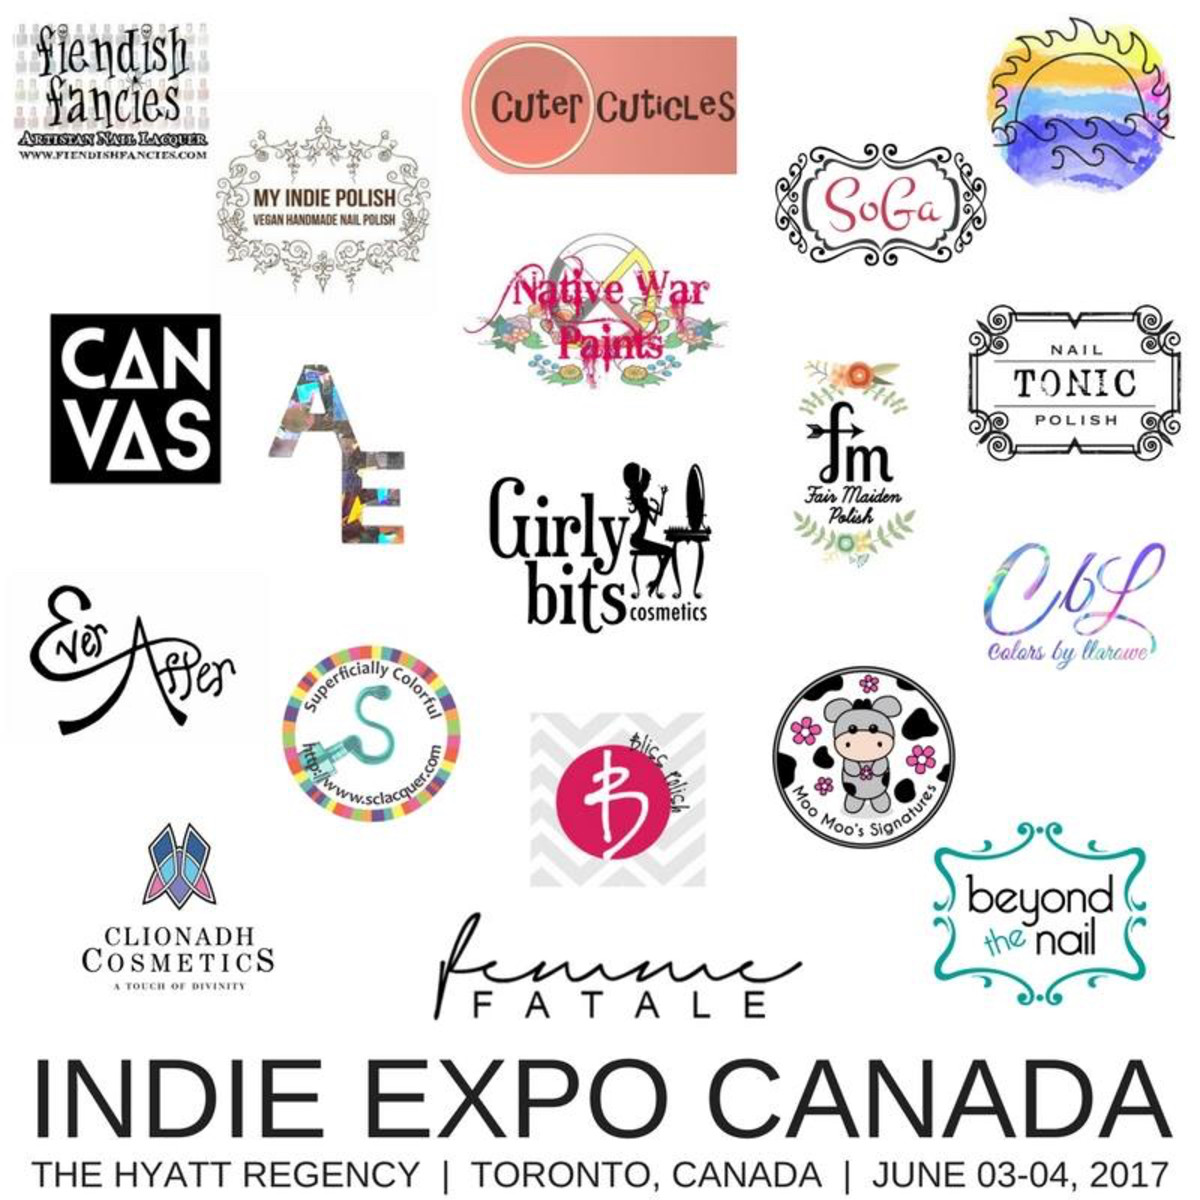 Indie Expo Toronto Canada 2017 Vendors